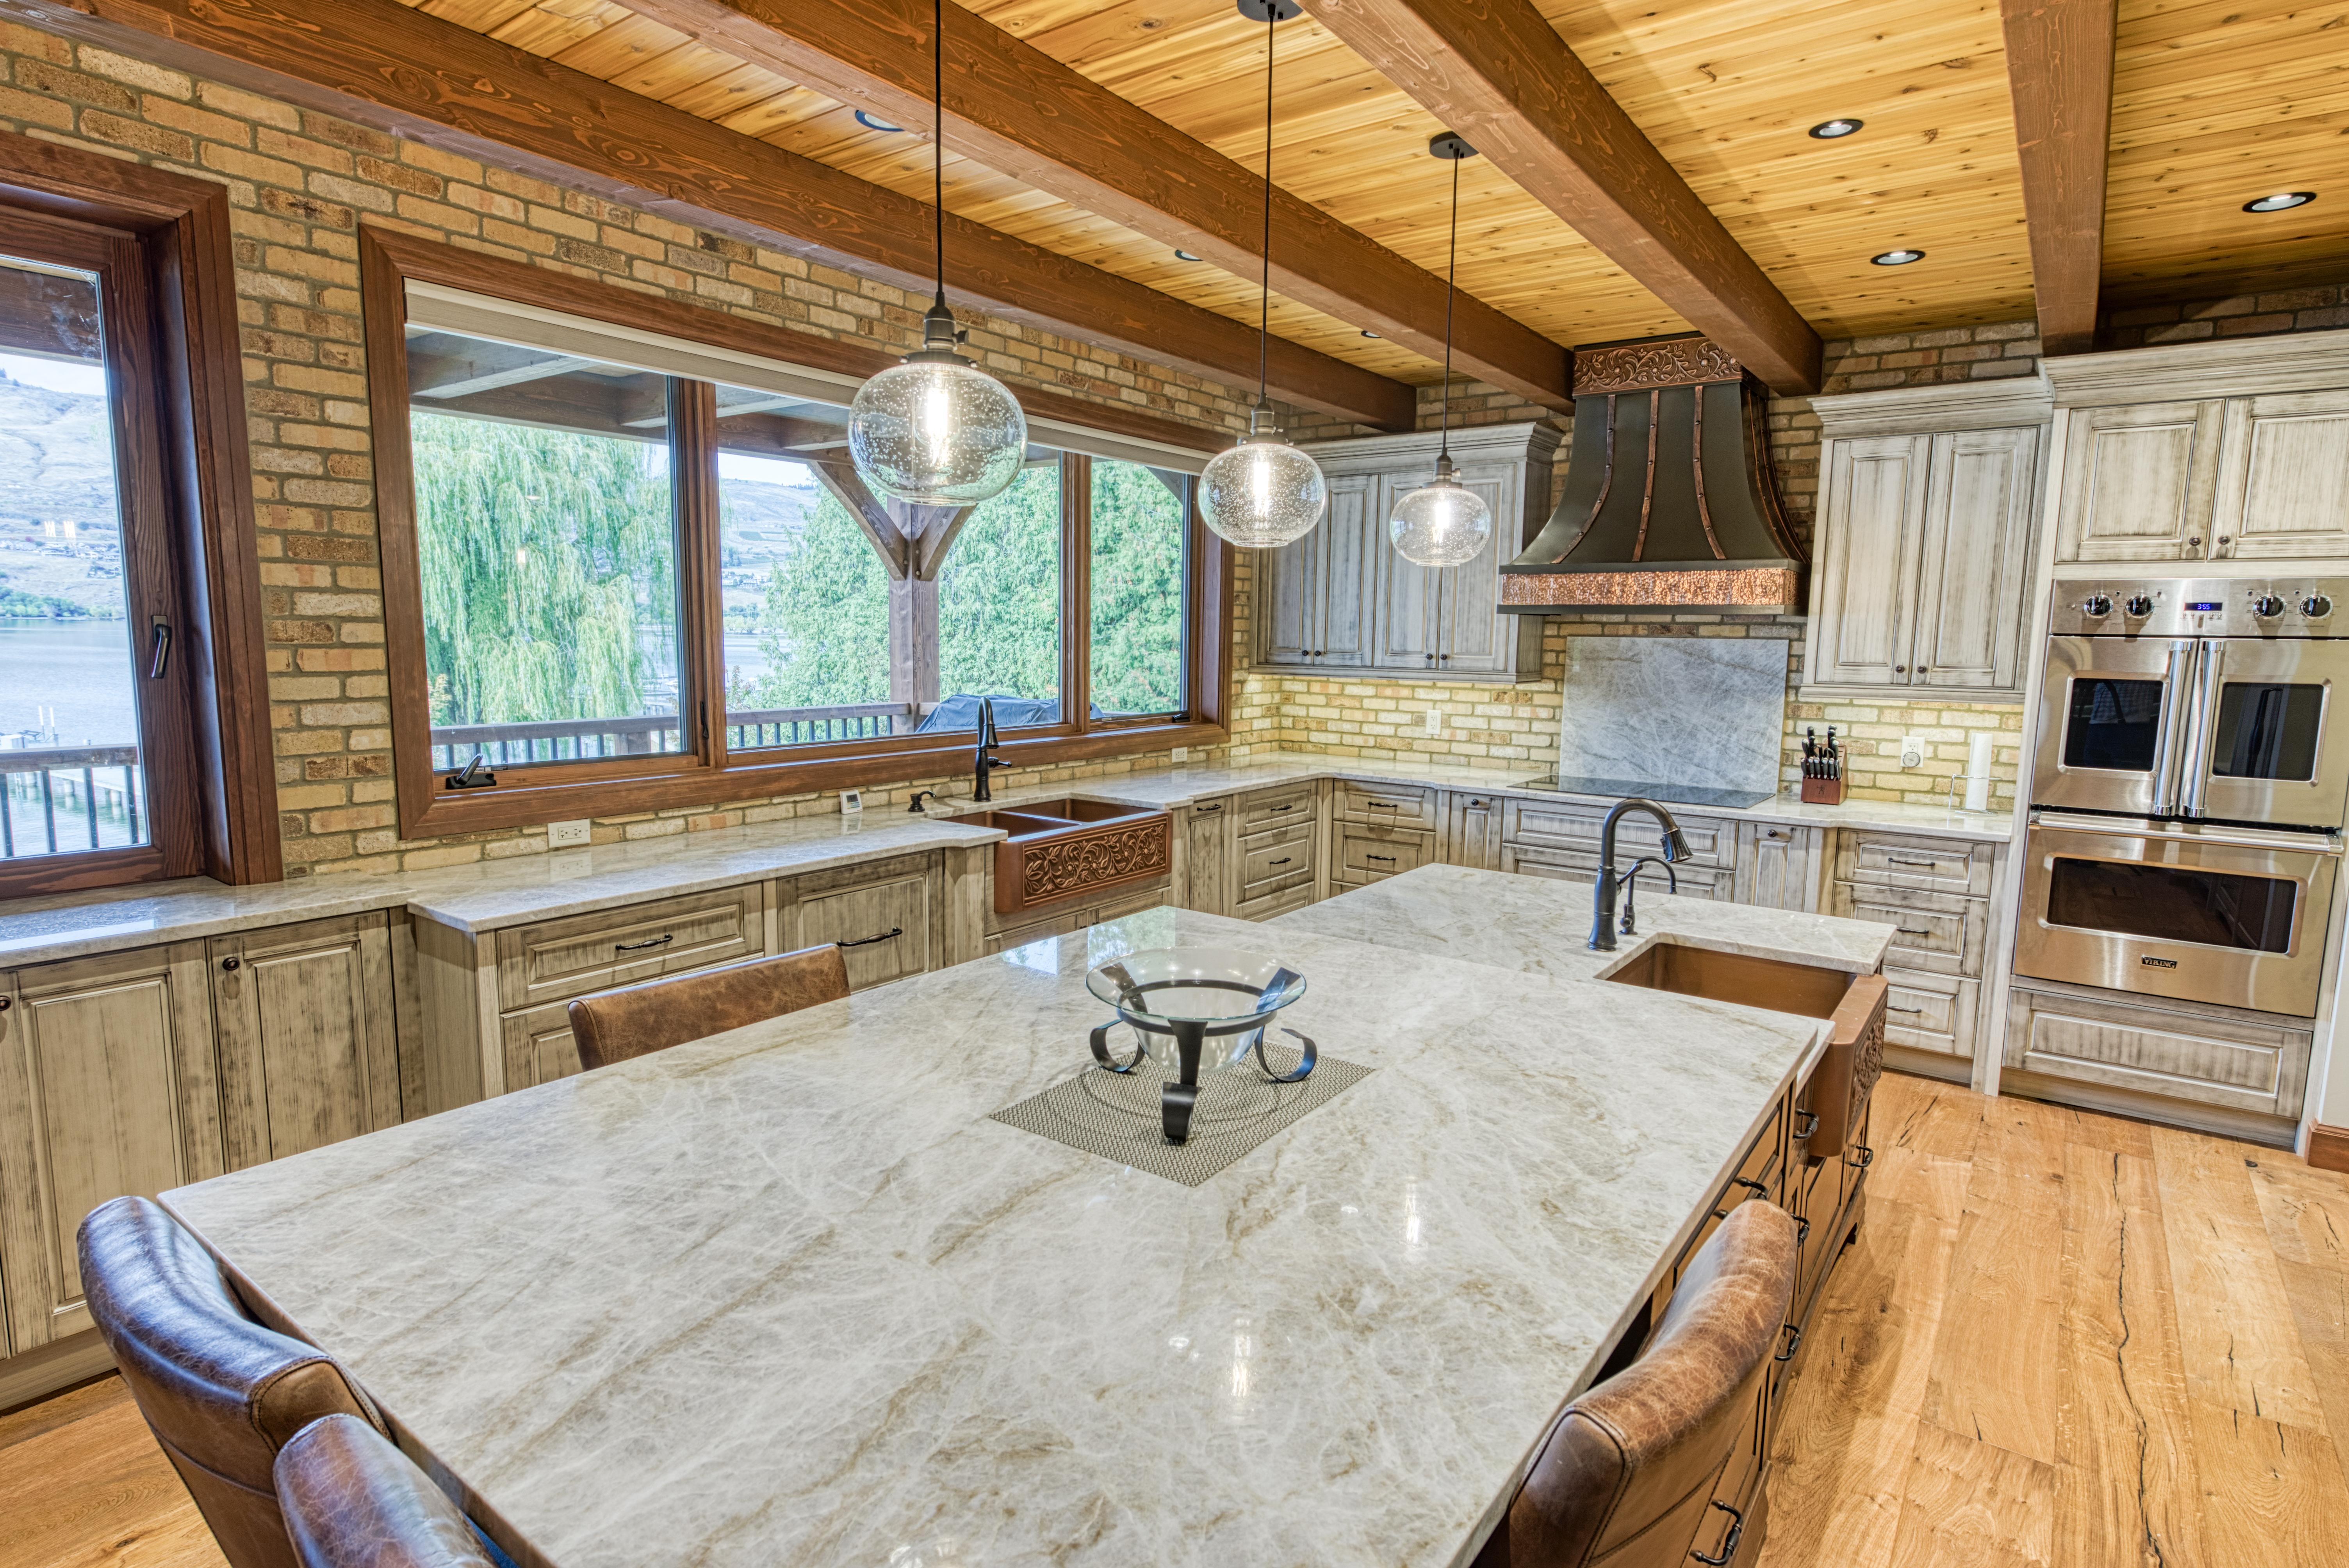 Copper kitchen and island sink